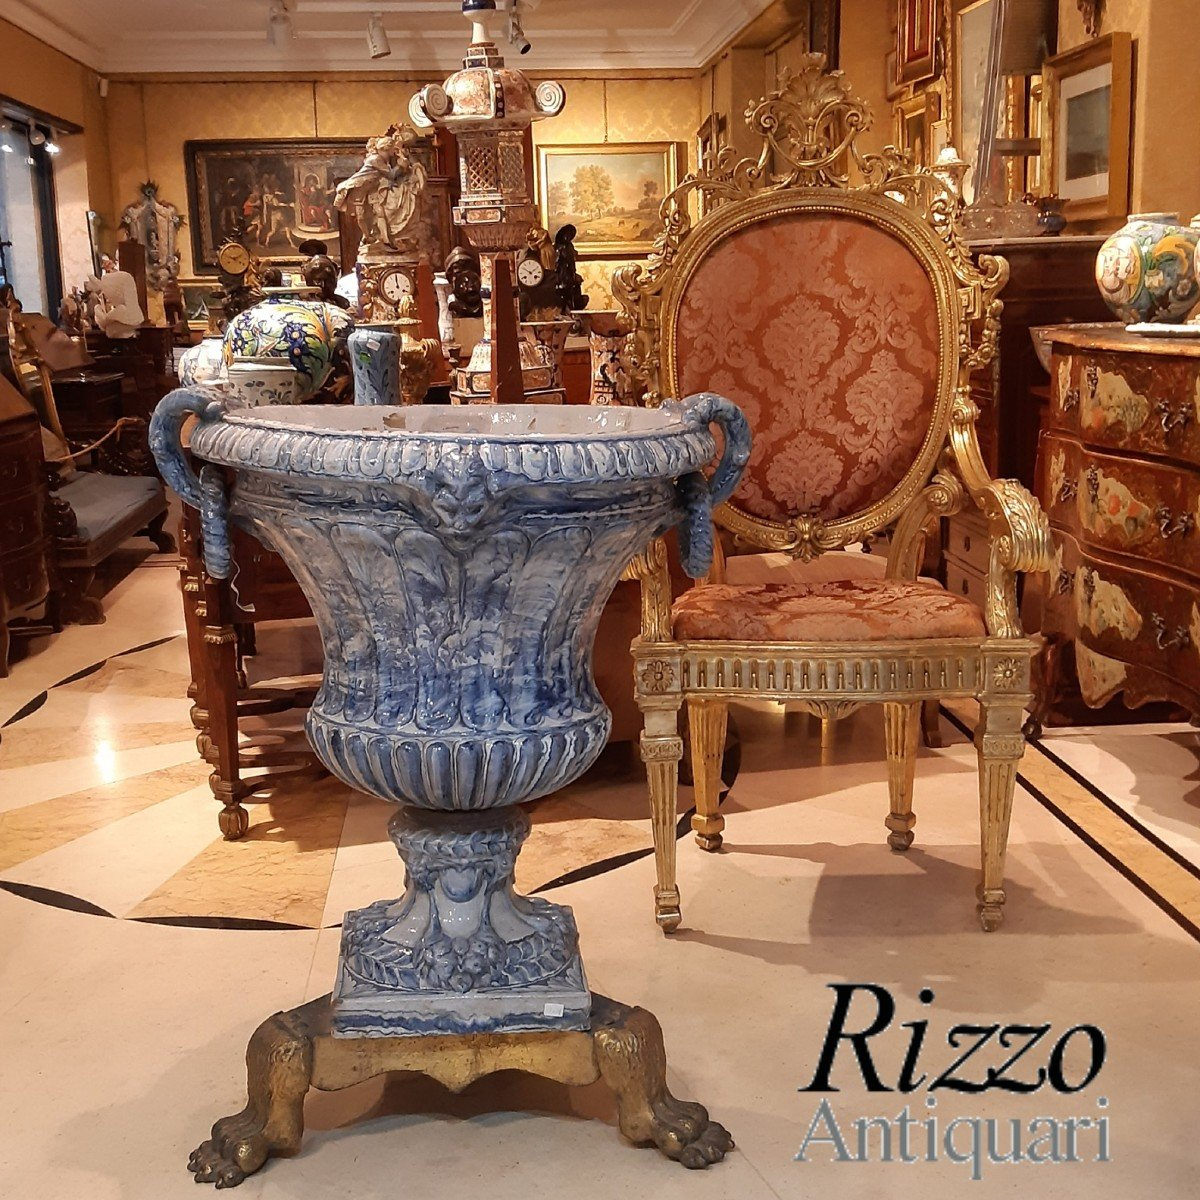 Rizzo Antiquari